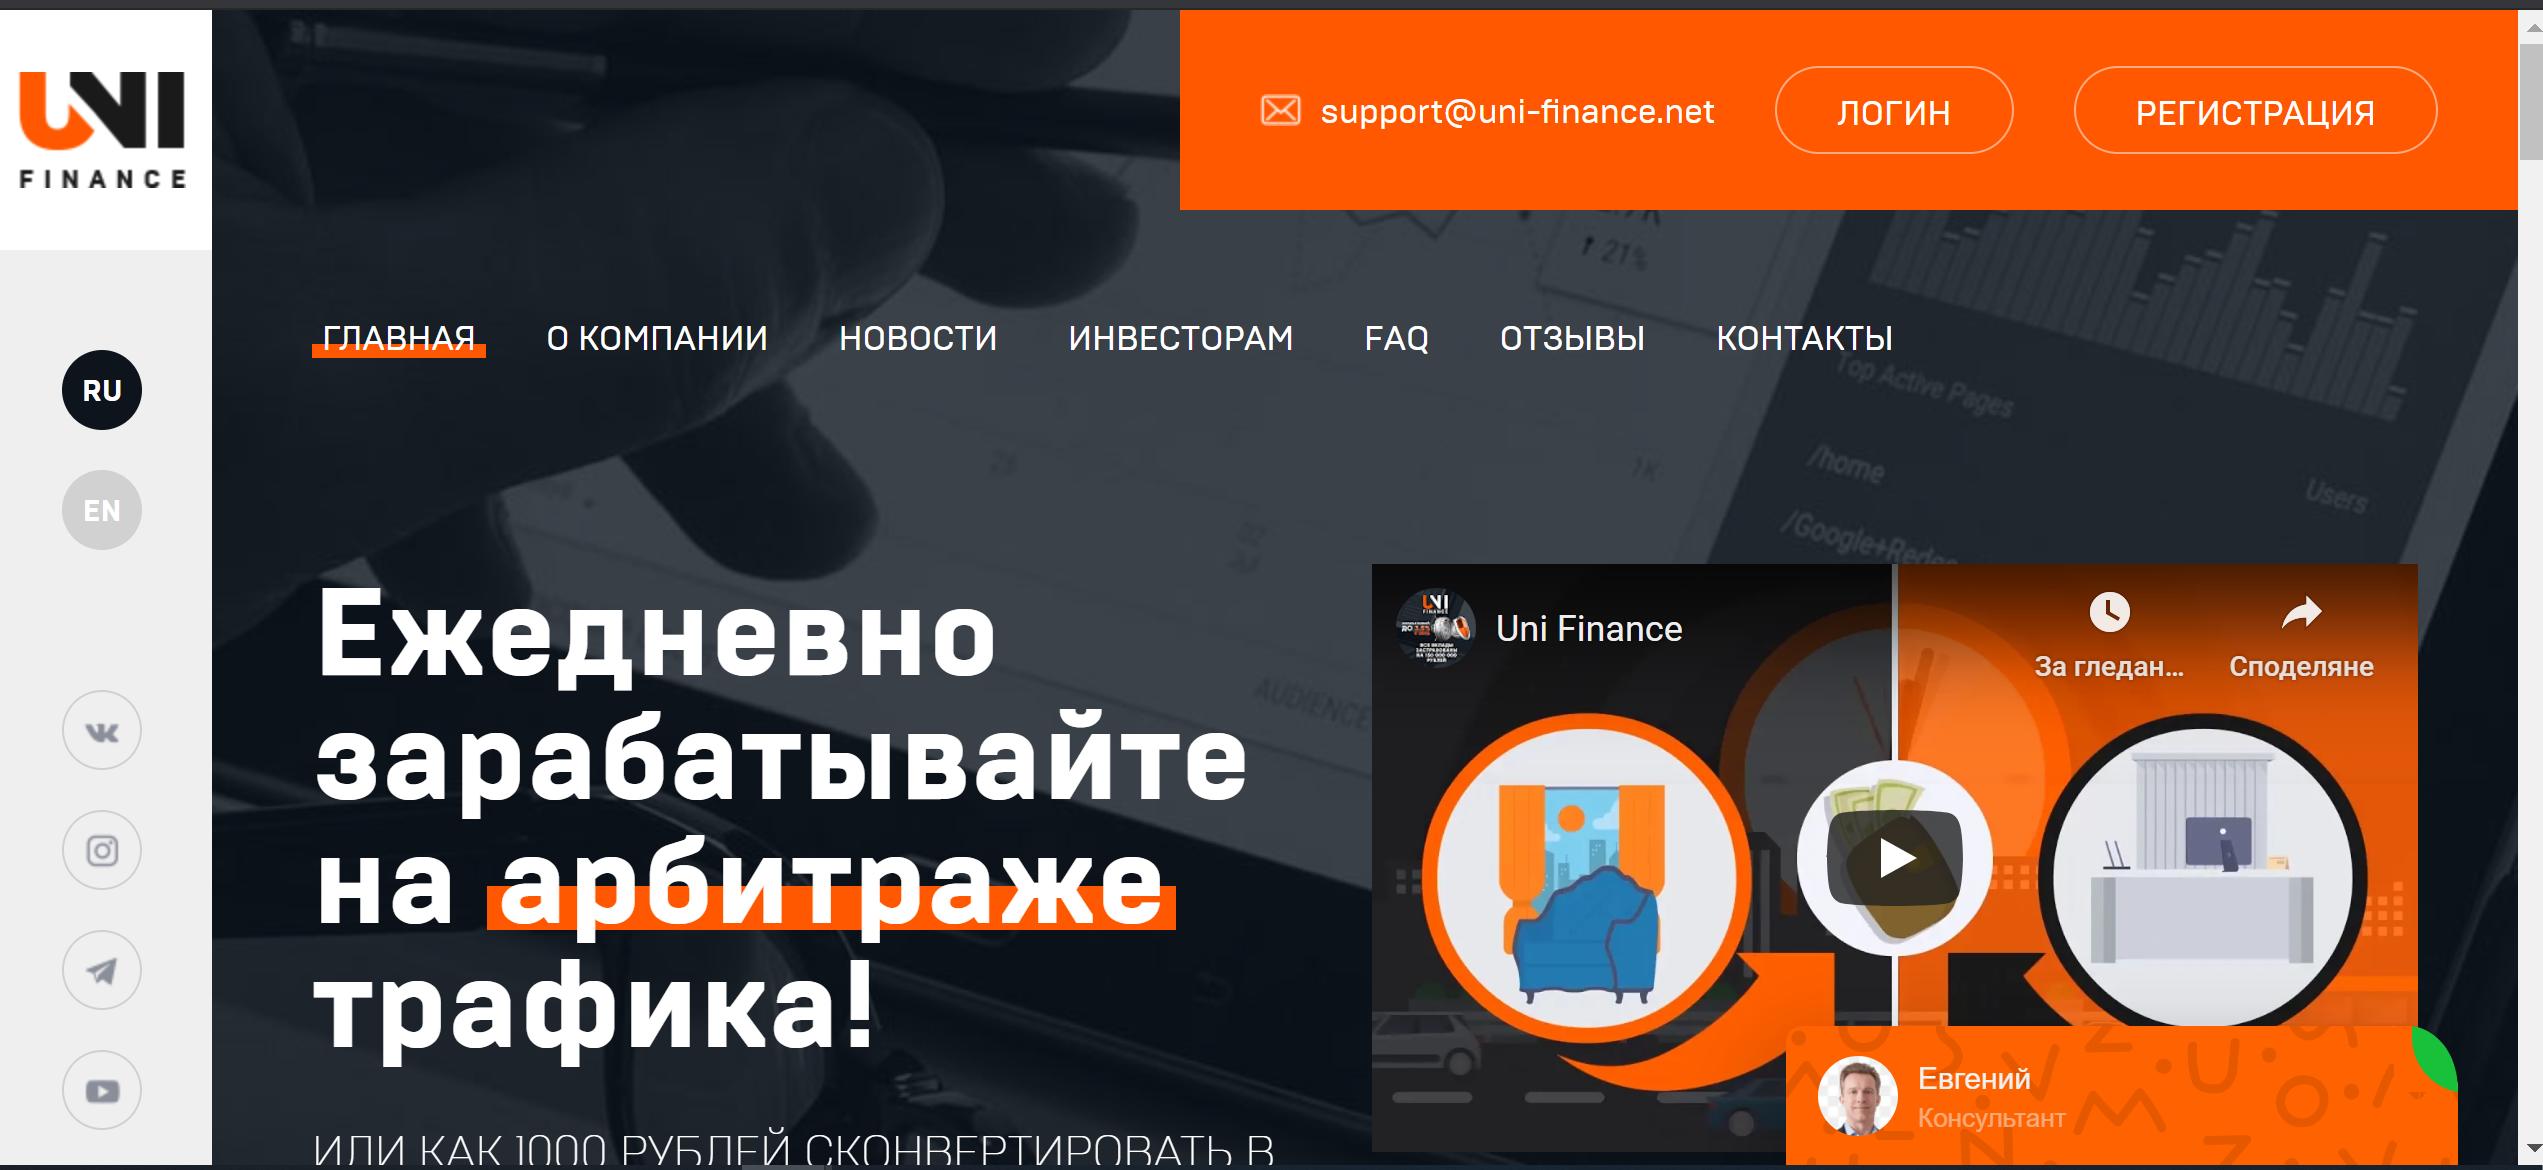 uni-finance.net review